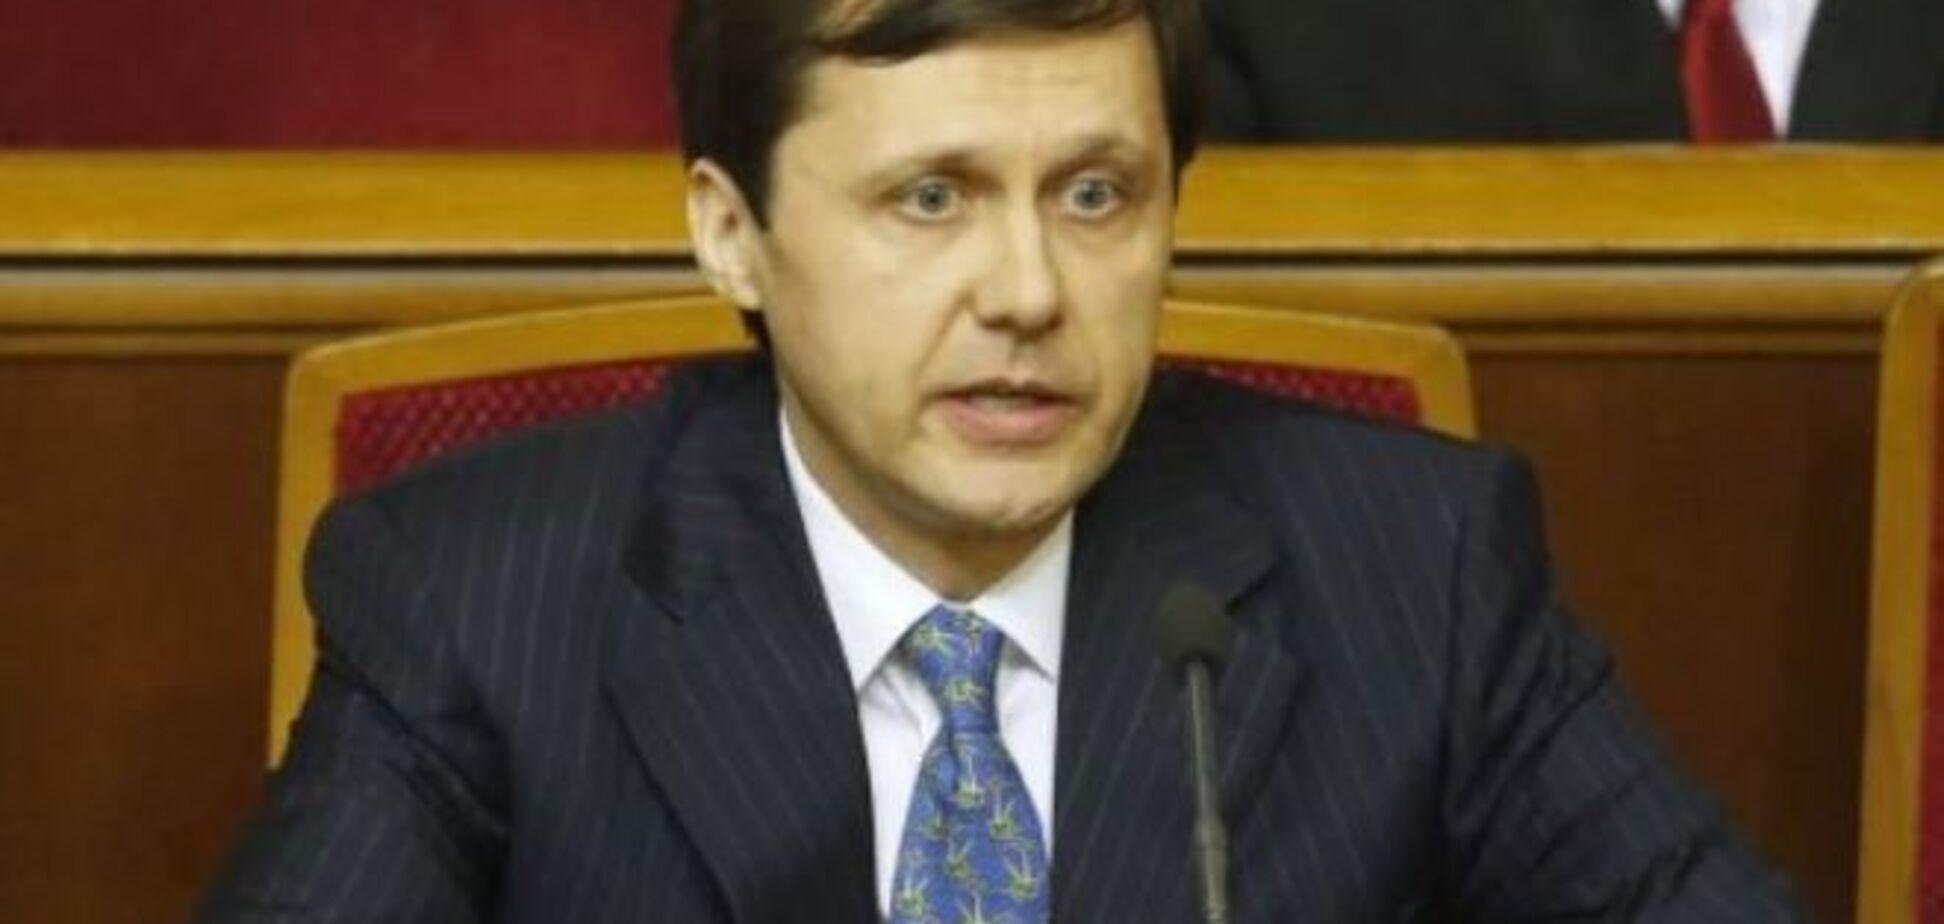 Шевченко предрек Яценюку отставку через 3 месяца